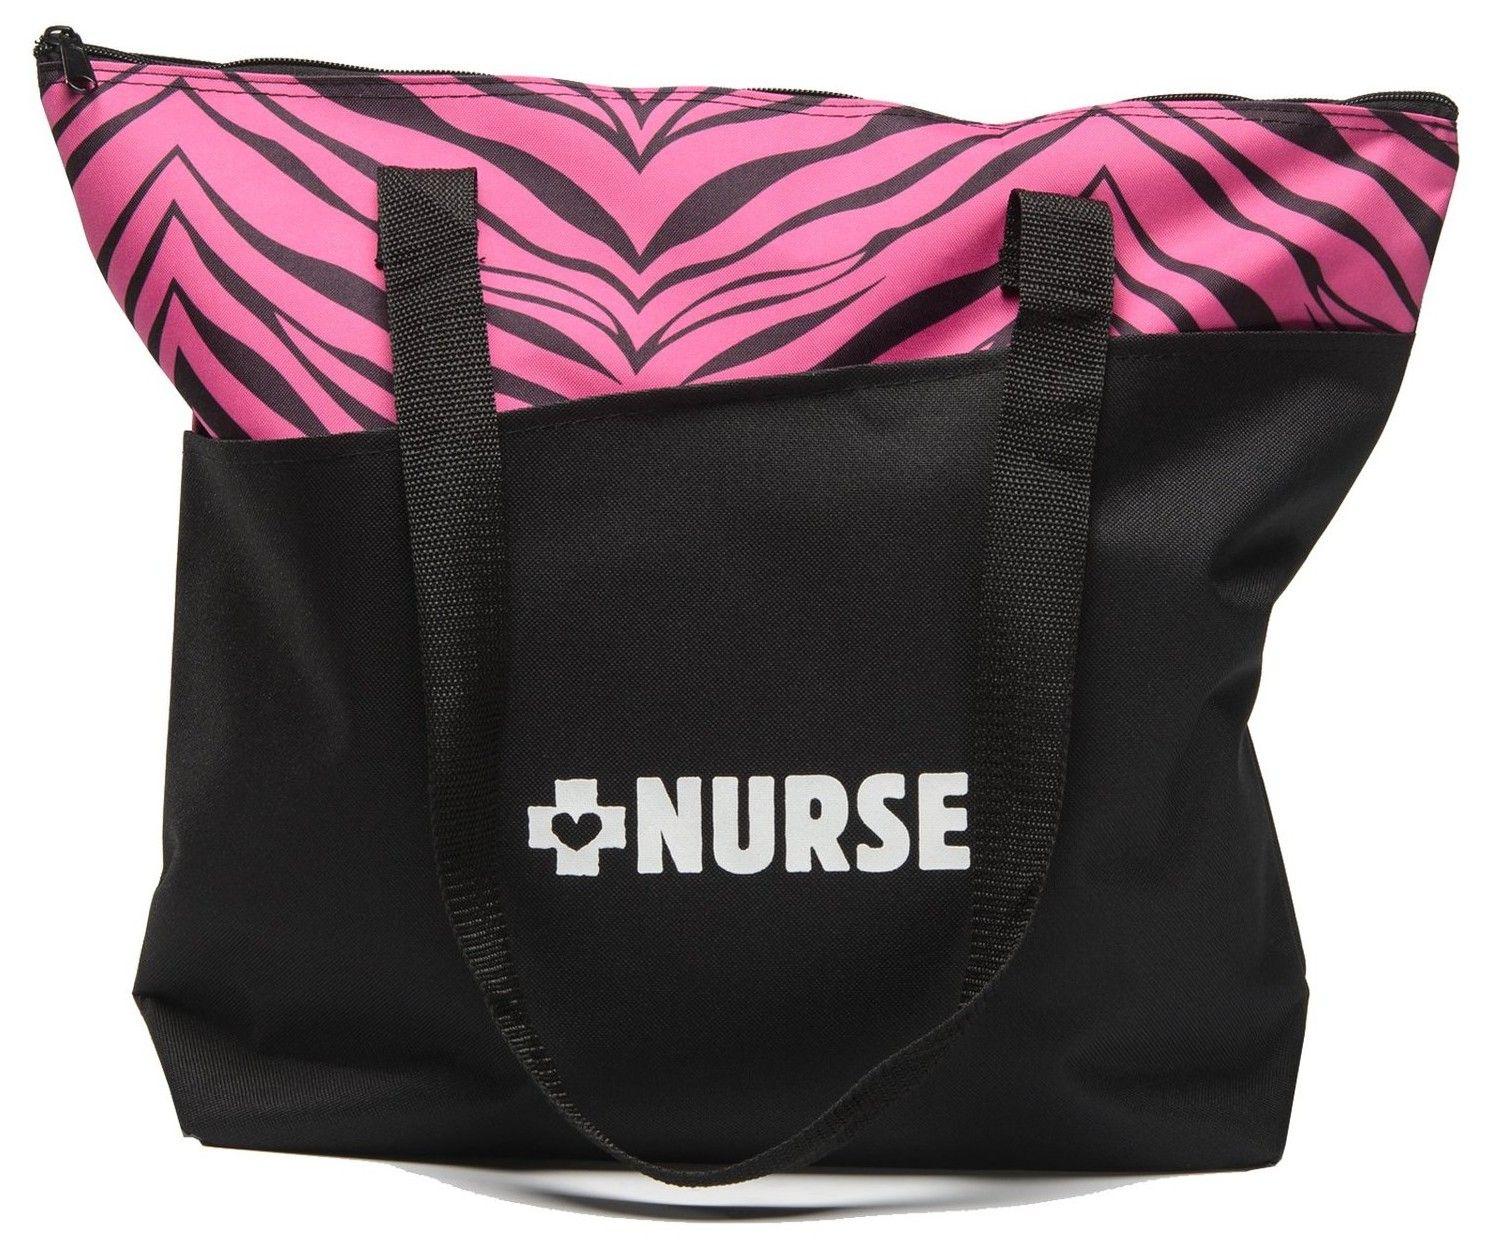 personalized nurse gifts amazon